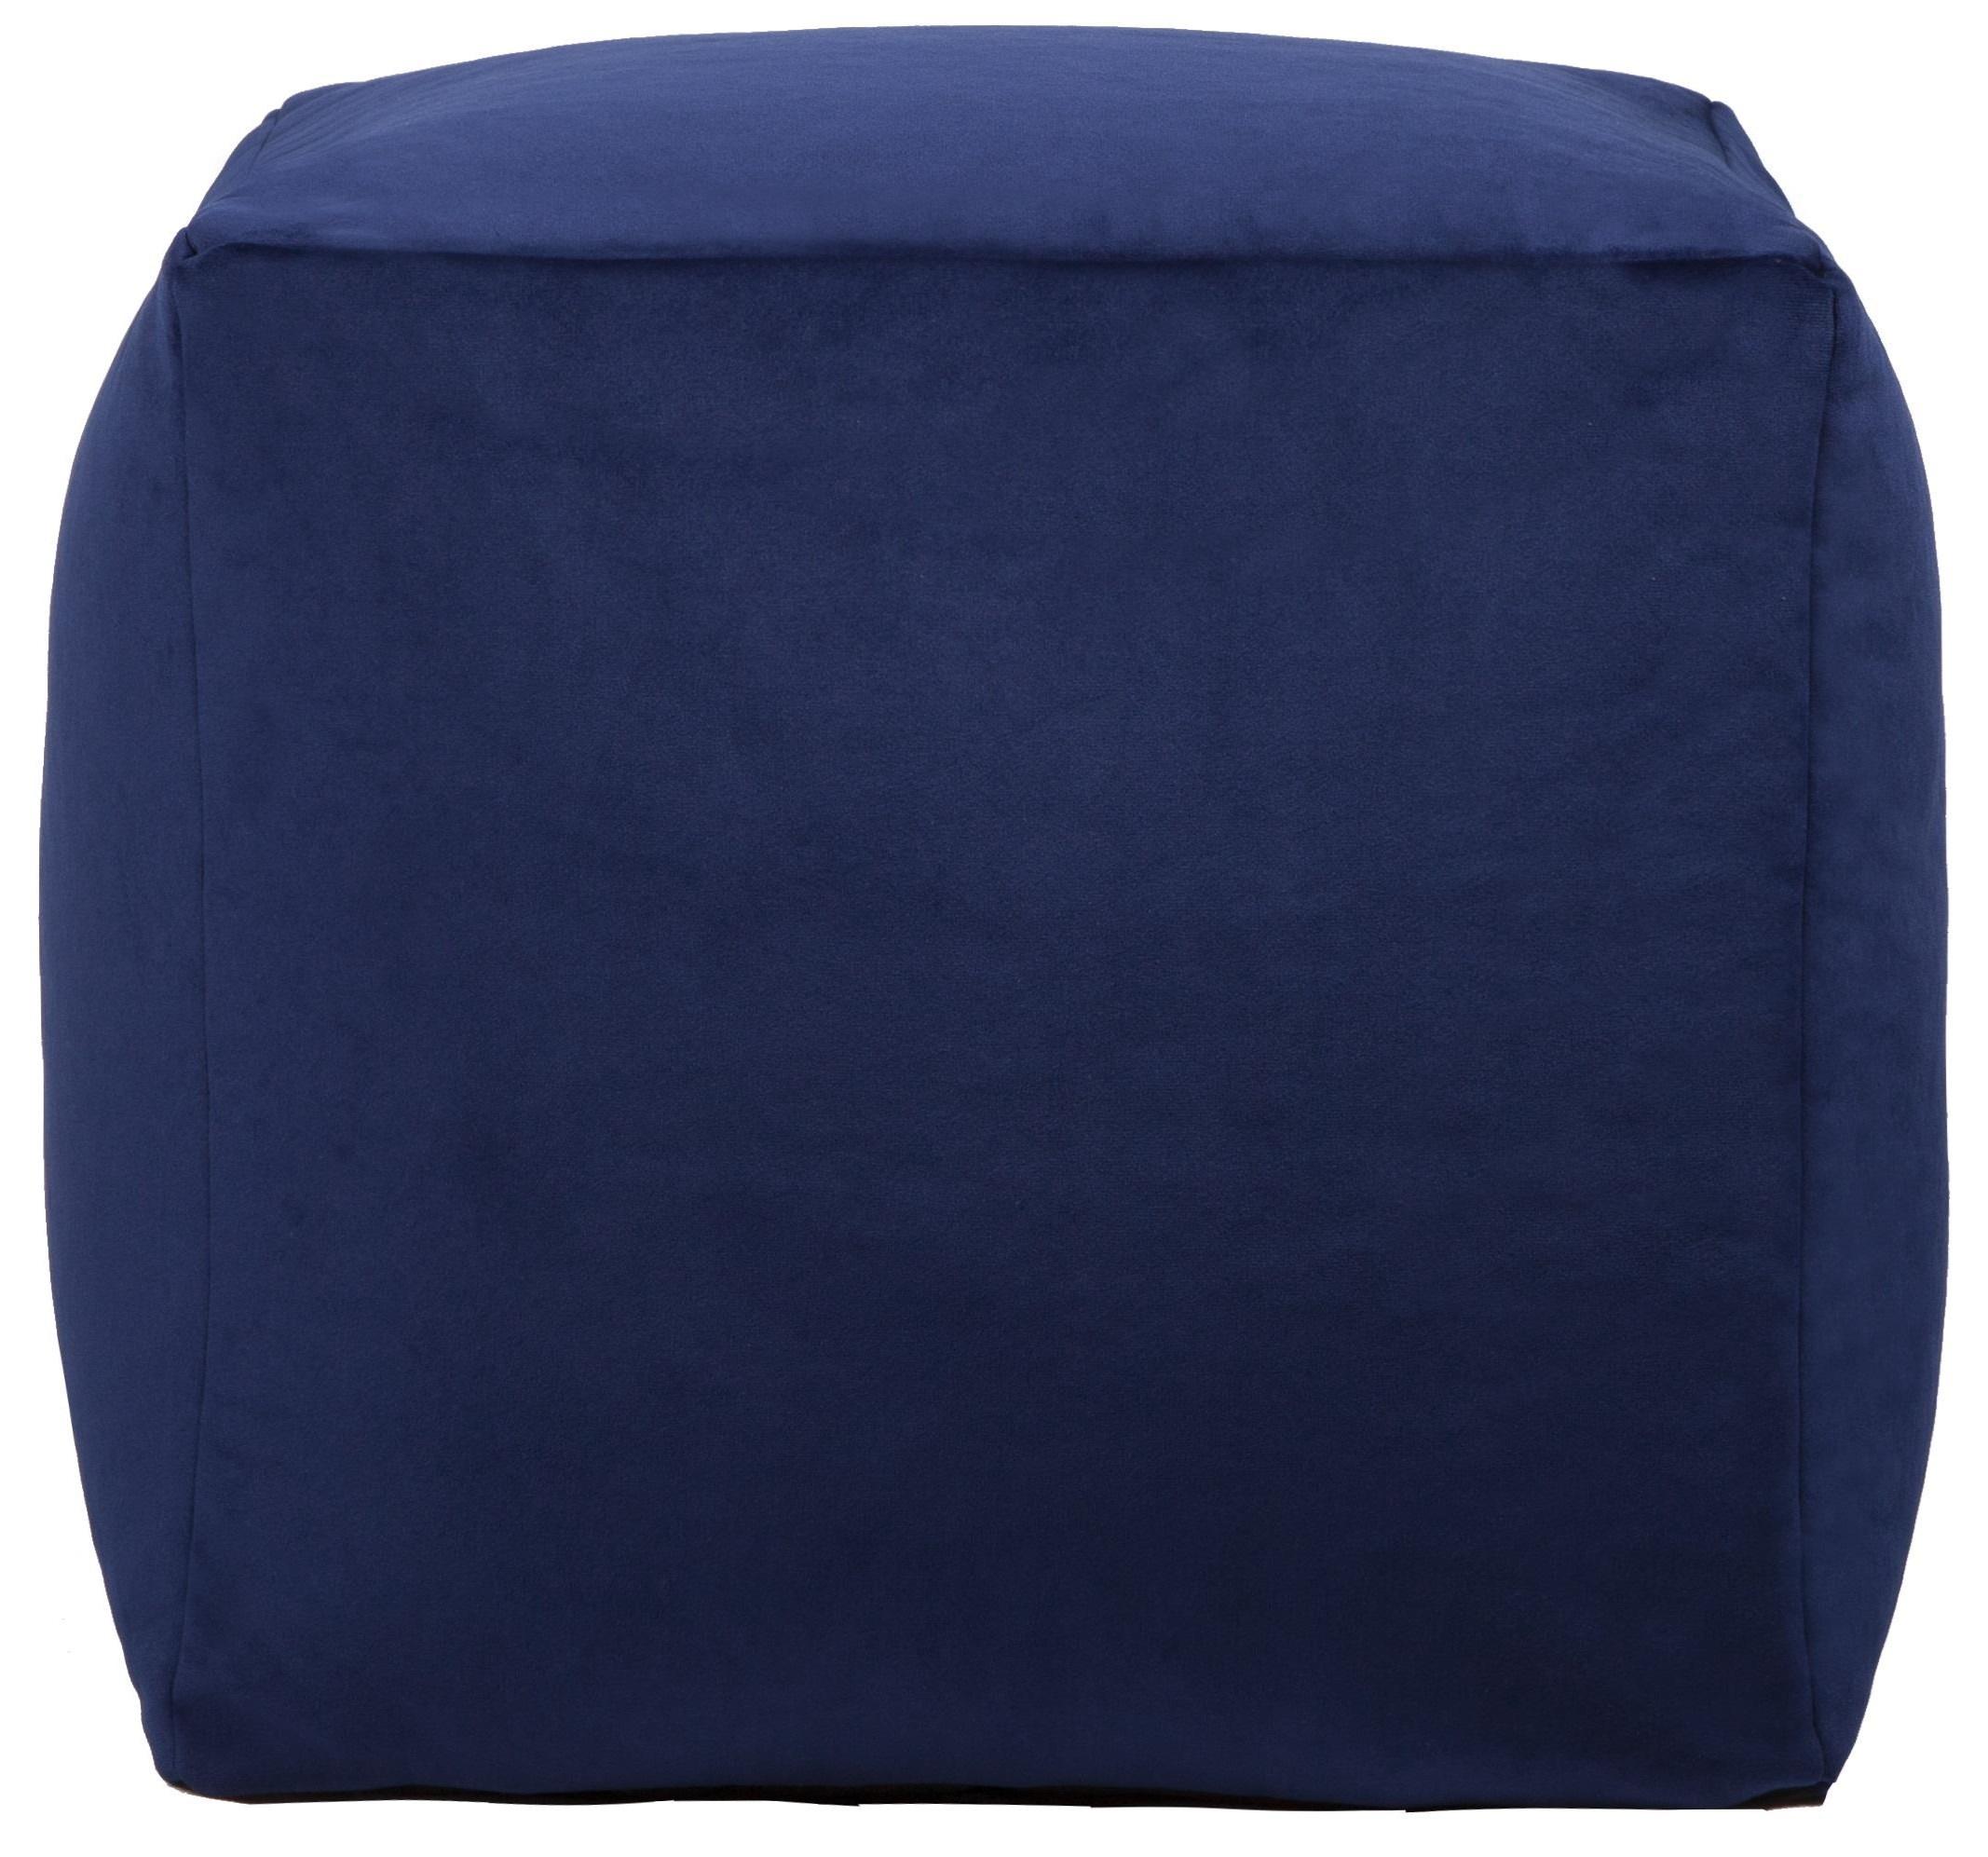 Beanbag Blue Cube Beanbag by Lazy Life Paris at HomeWorld Furniture